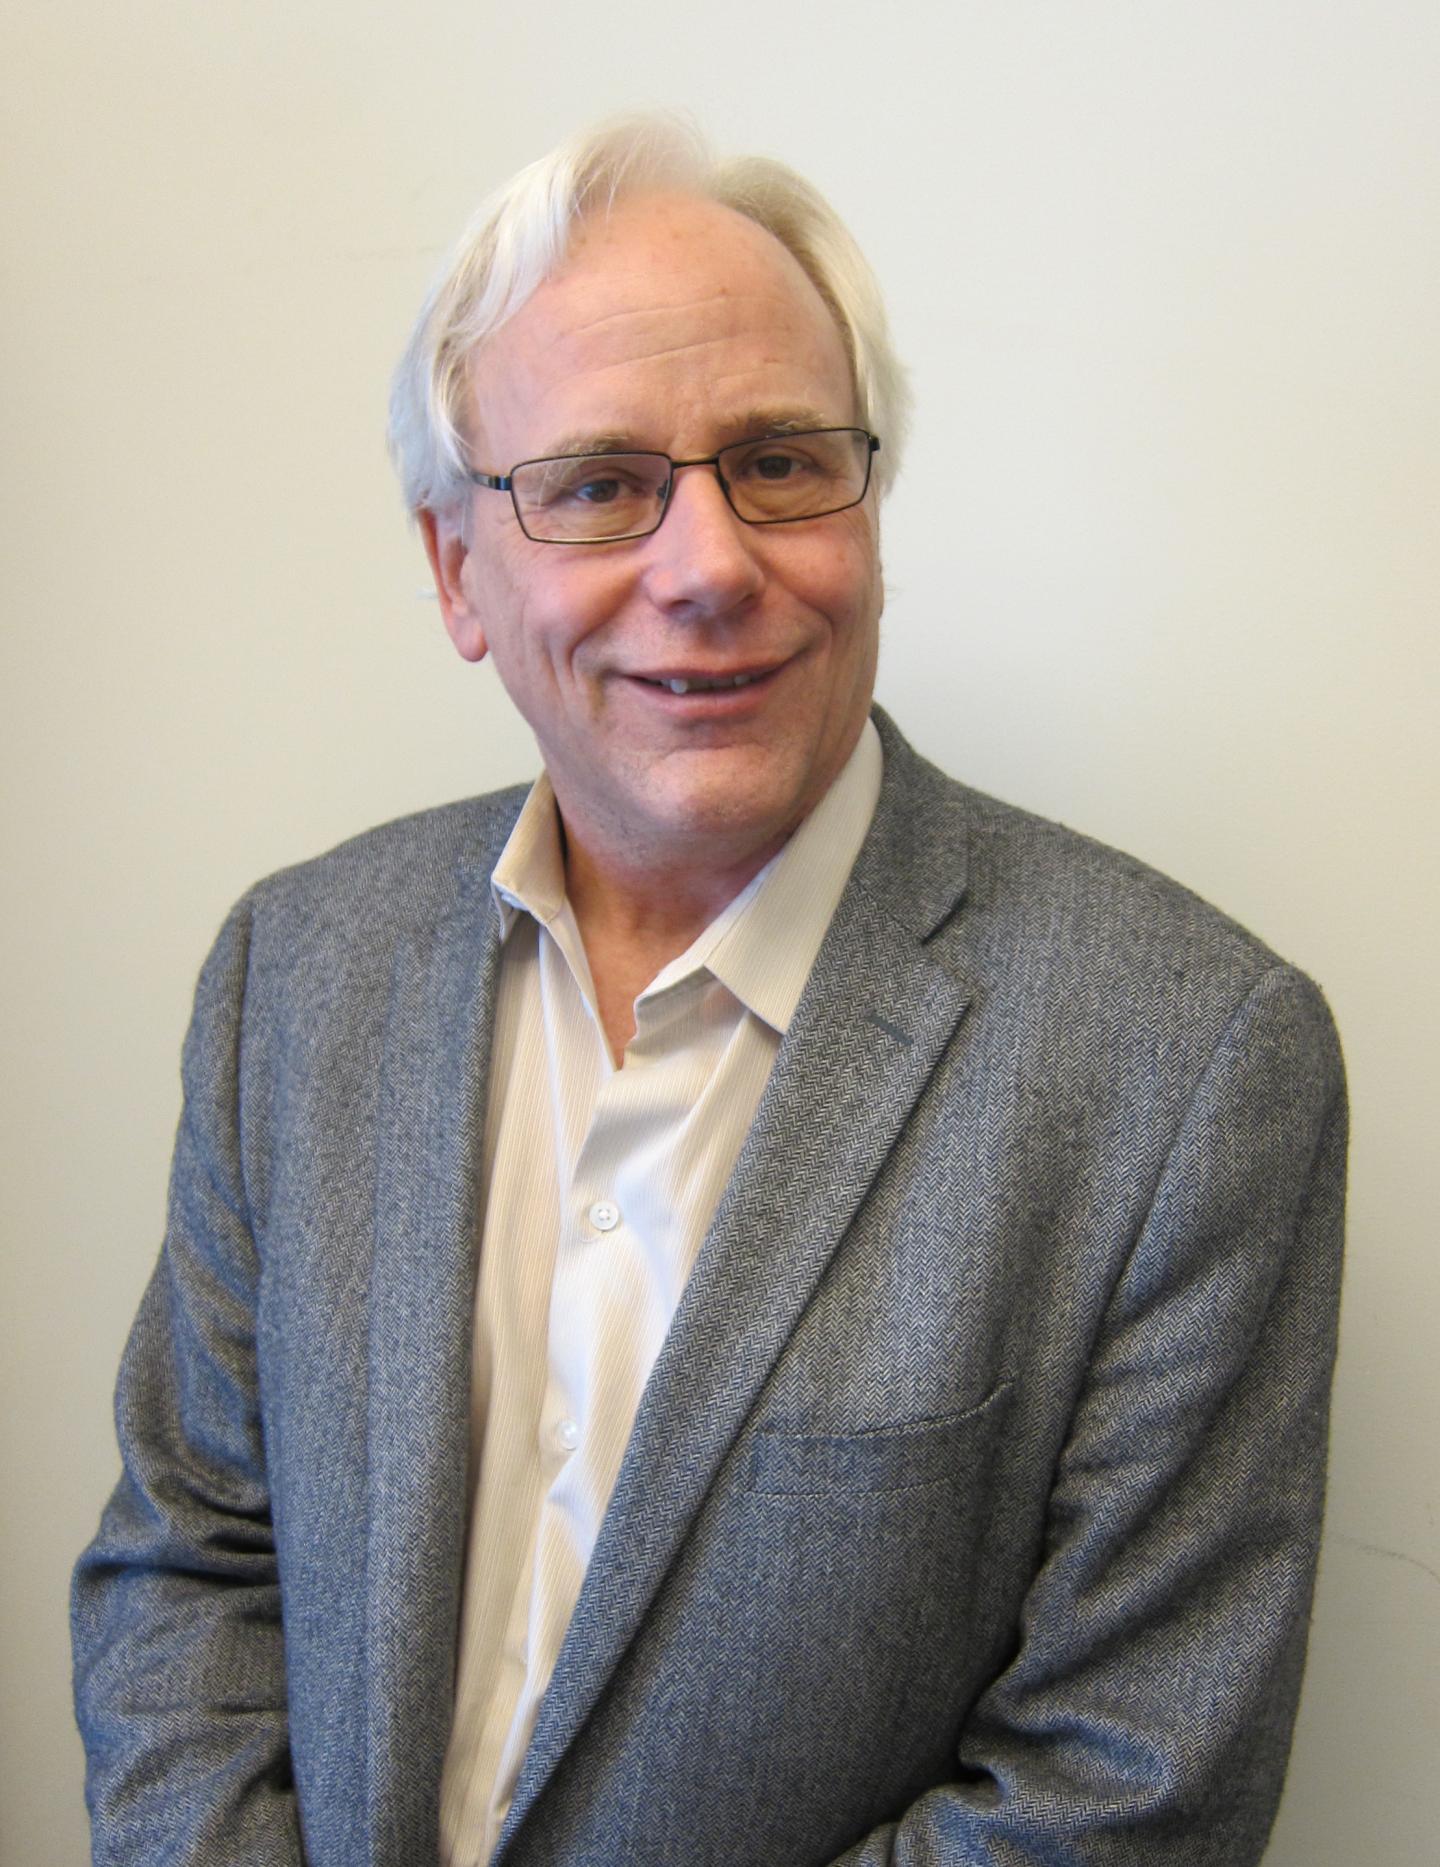 Daniel Stram, University of Southern California